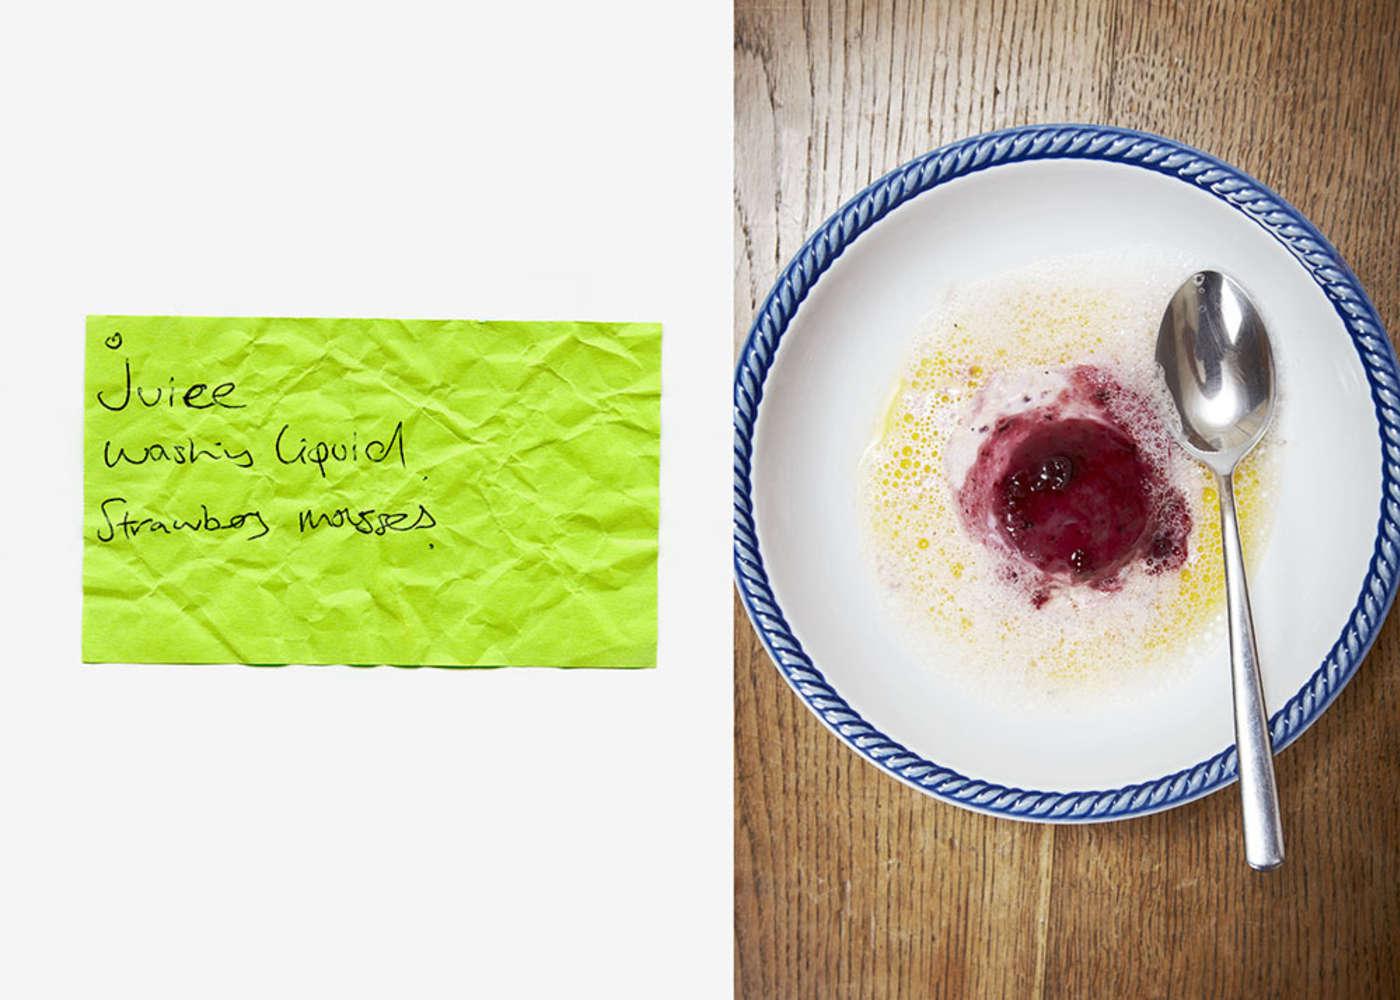 thomas_lakeman_shopping_list_cookbook_06